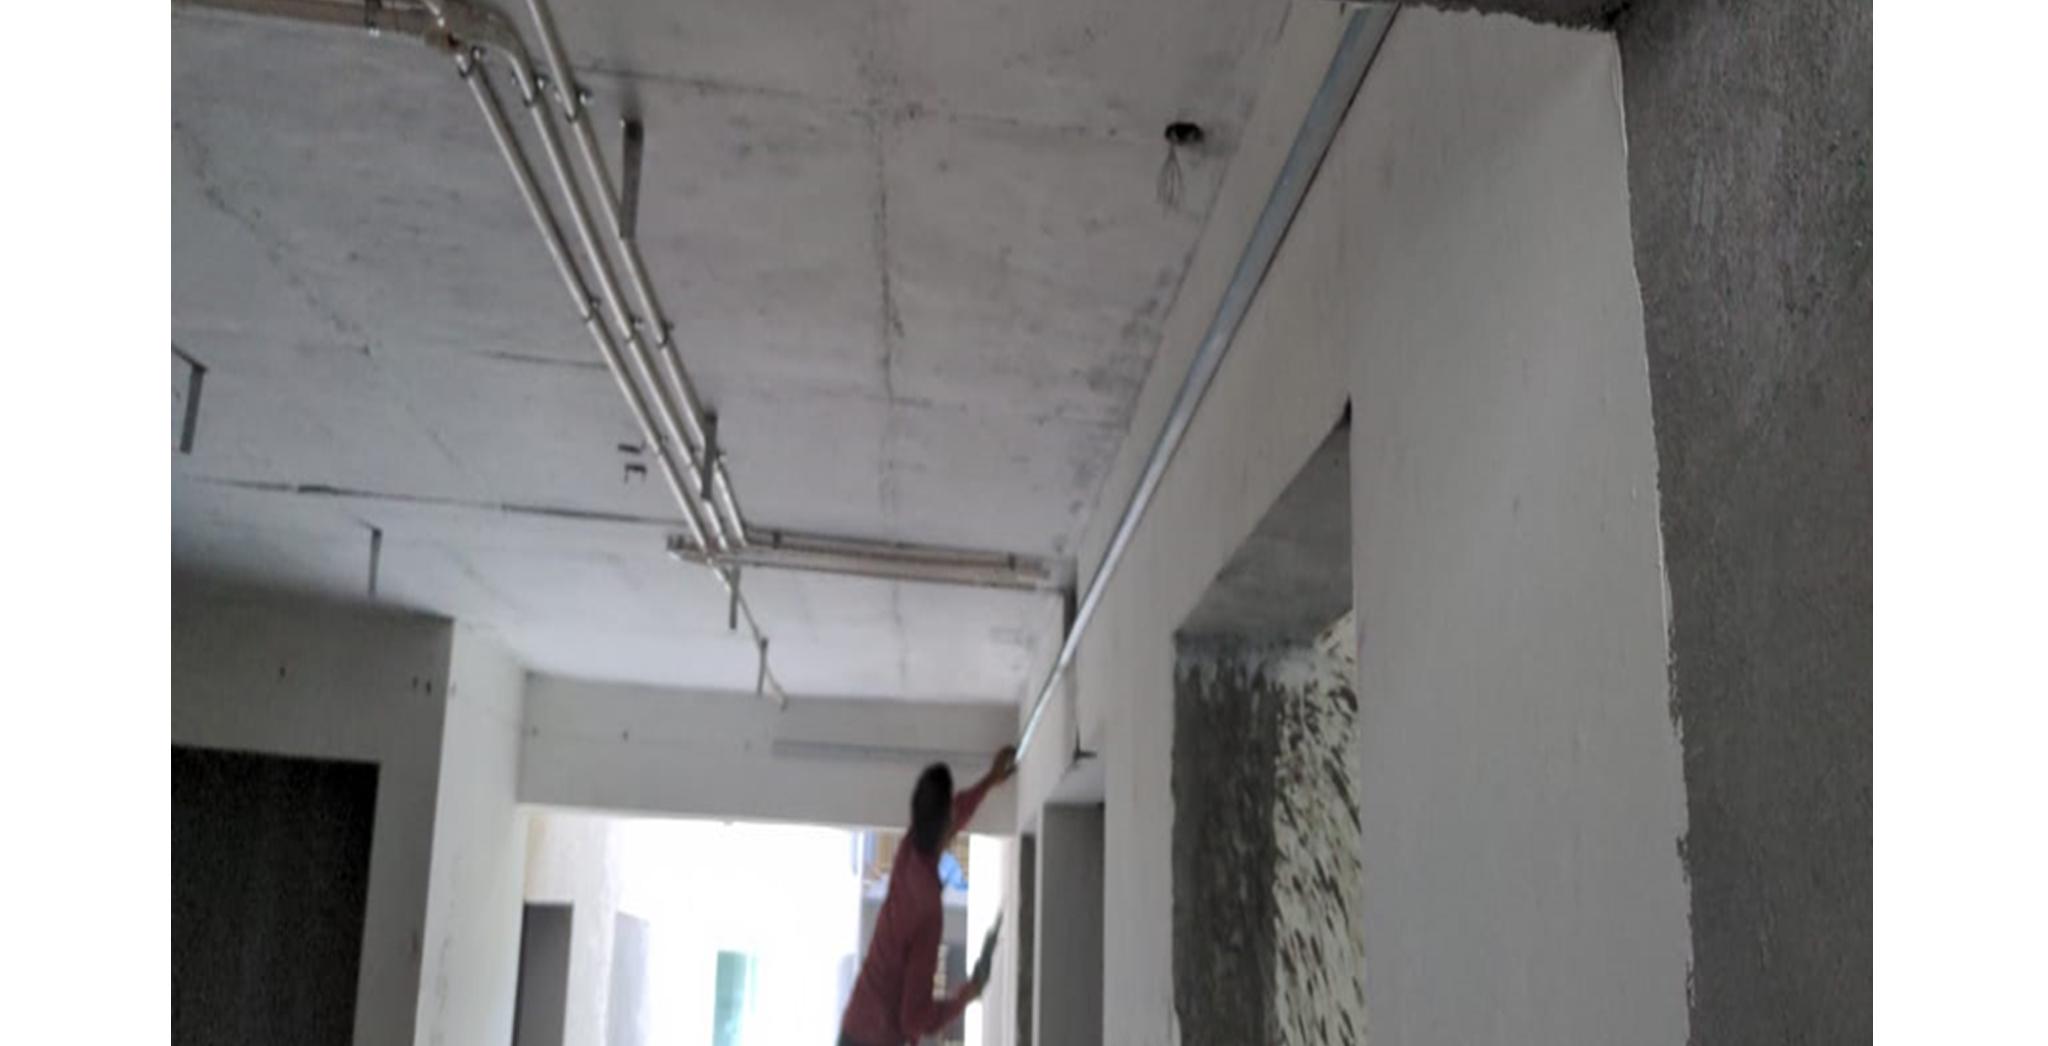 Aug 2021 - R Block: Ground floor Lobby False ceiling work in progress